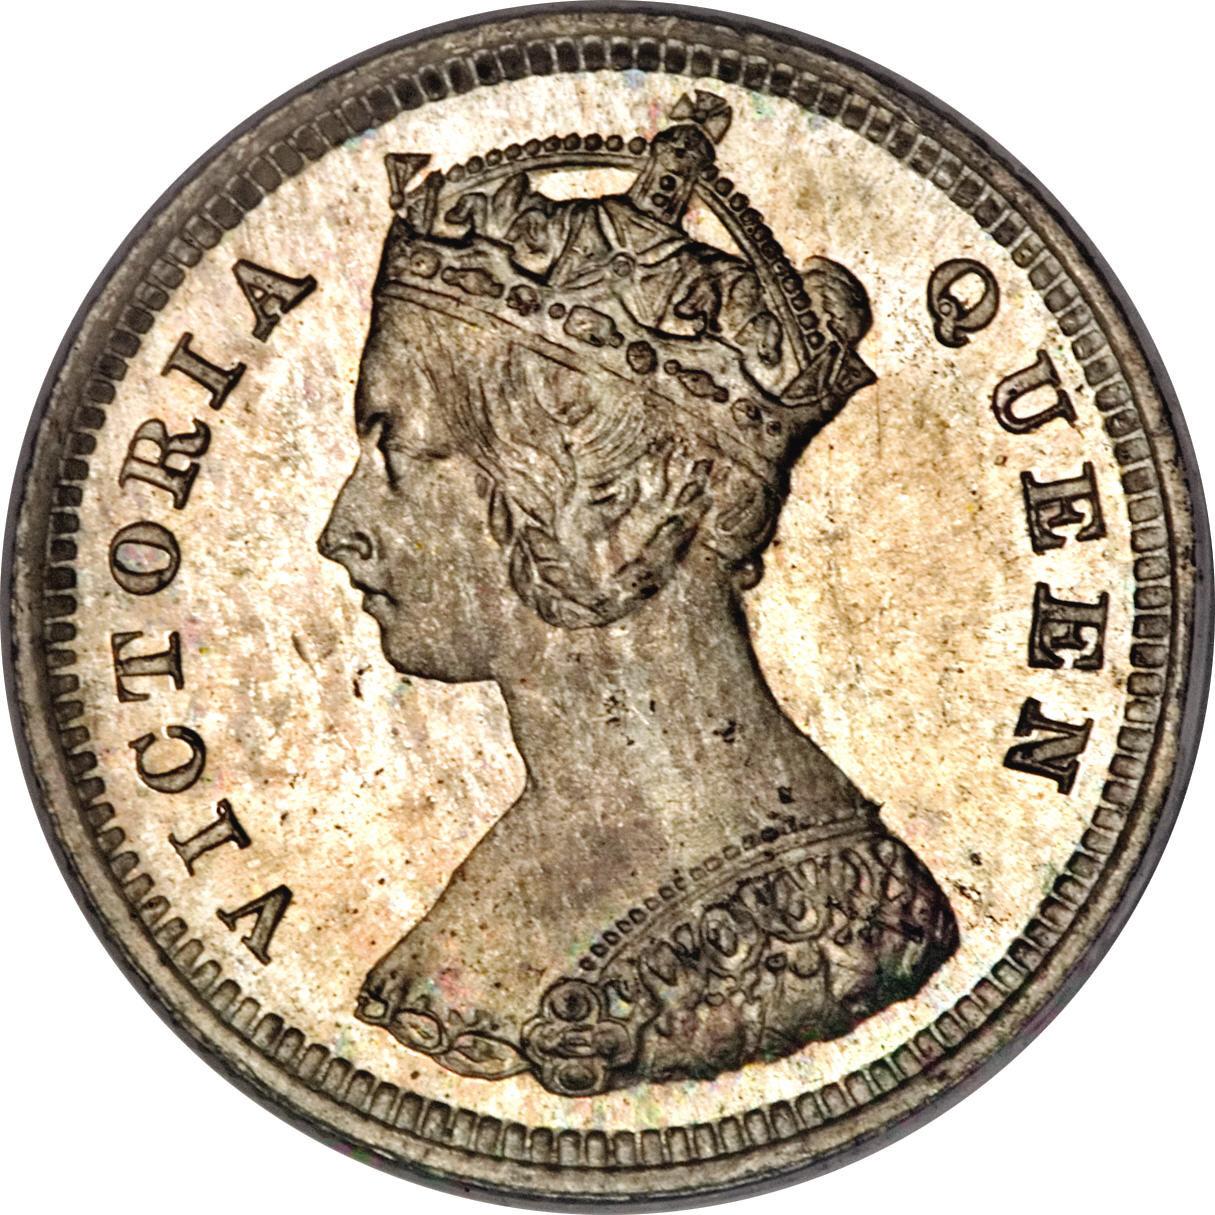 10 Cents Victoria Hong Kong Numista